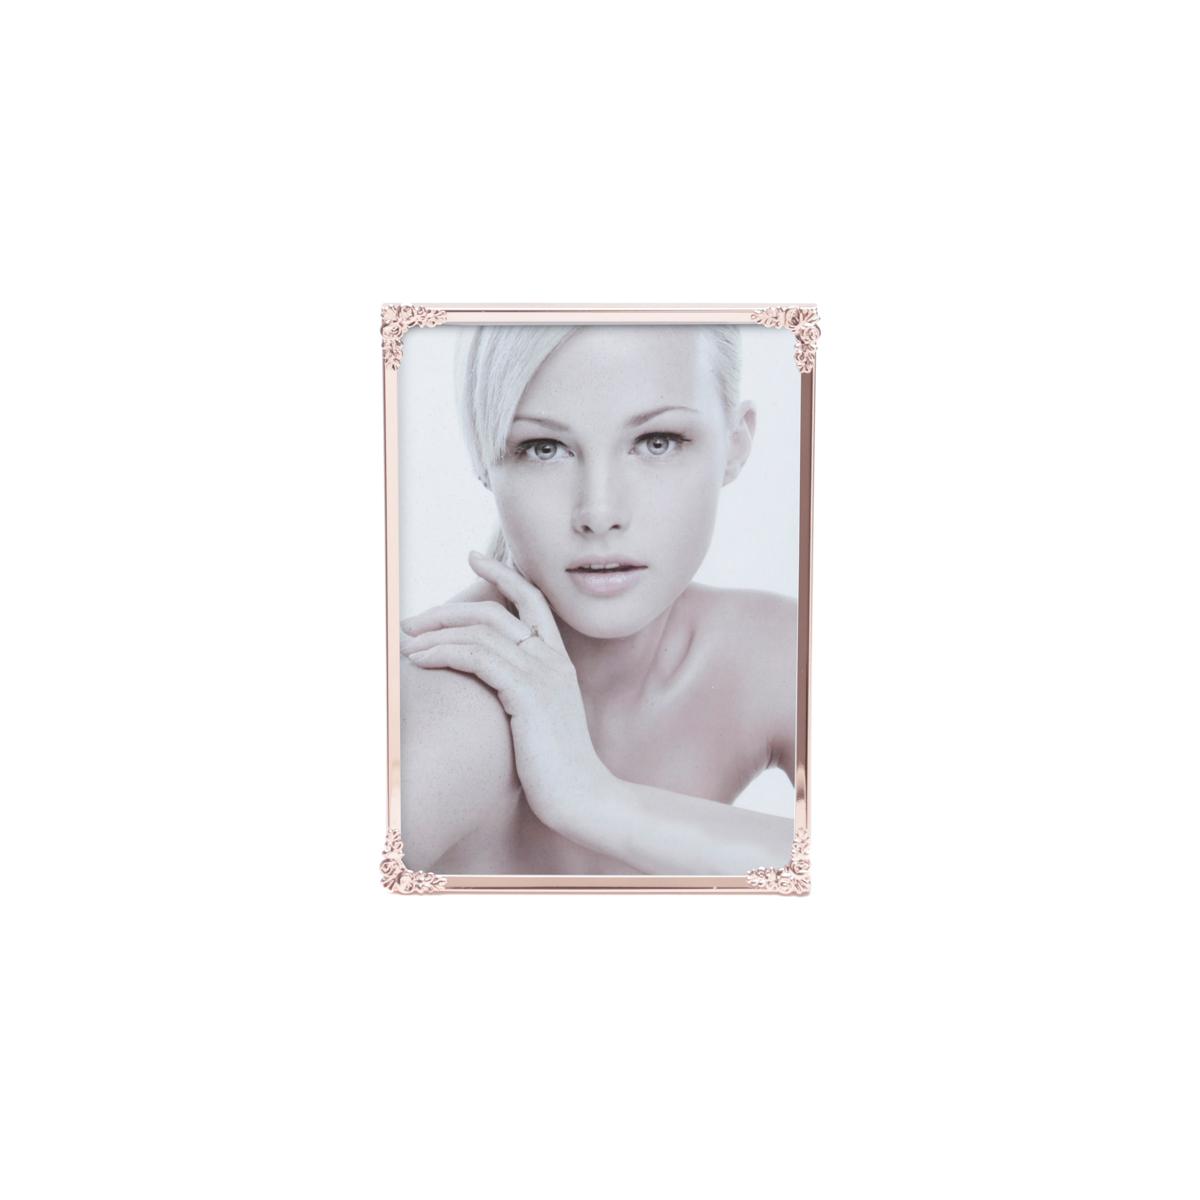 Porta-retrato aco Fleur Rose 21x26cm foto 20x25cm Rojemac